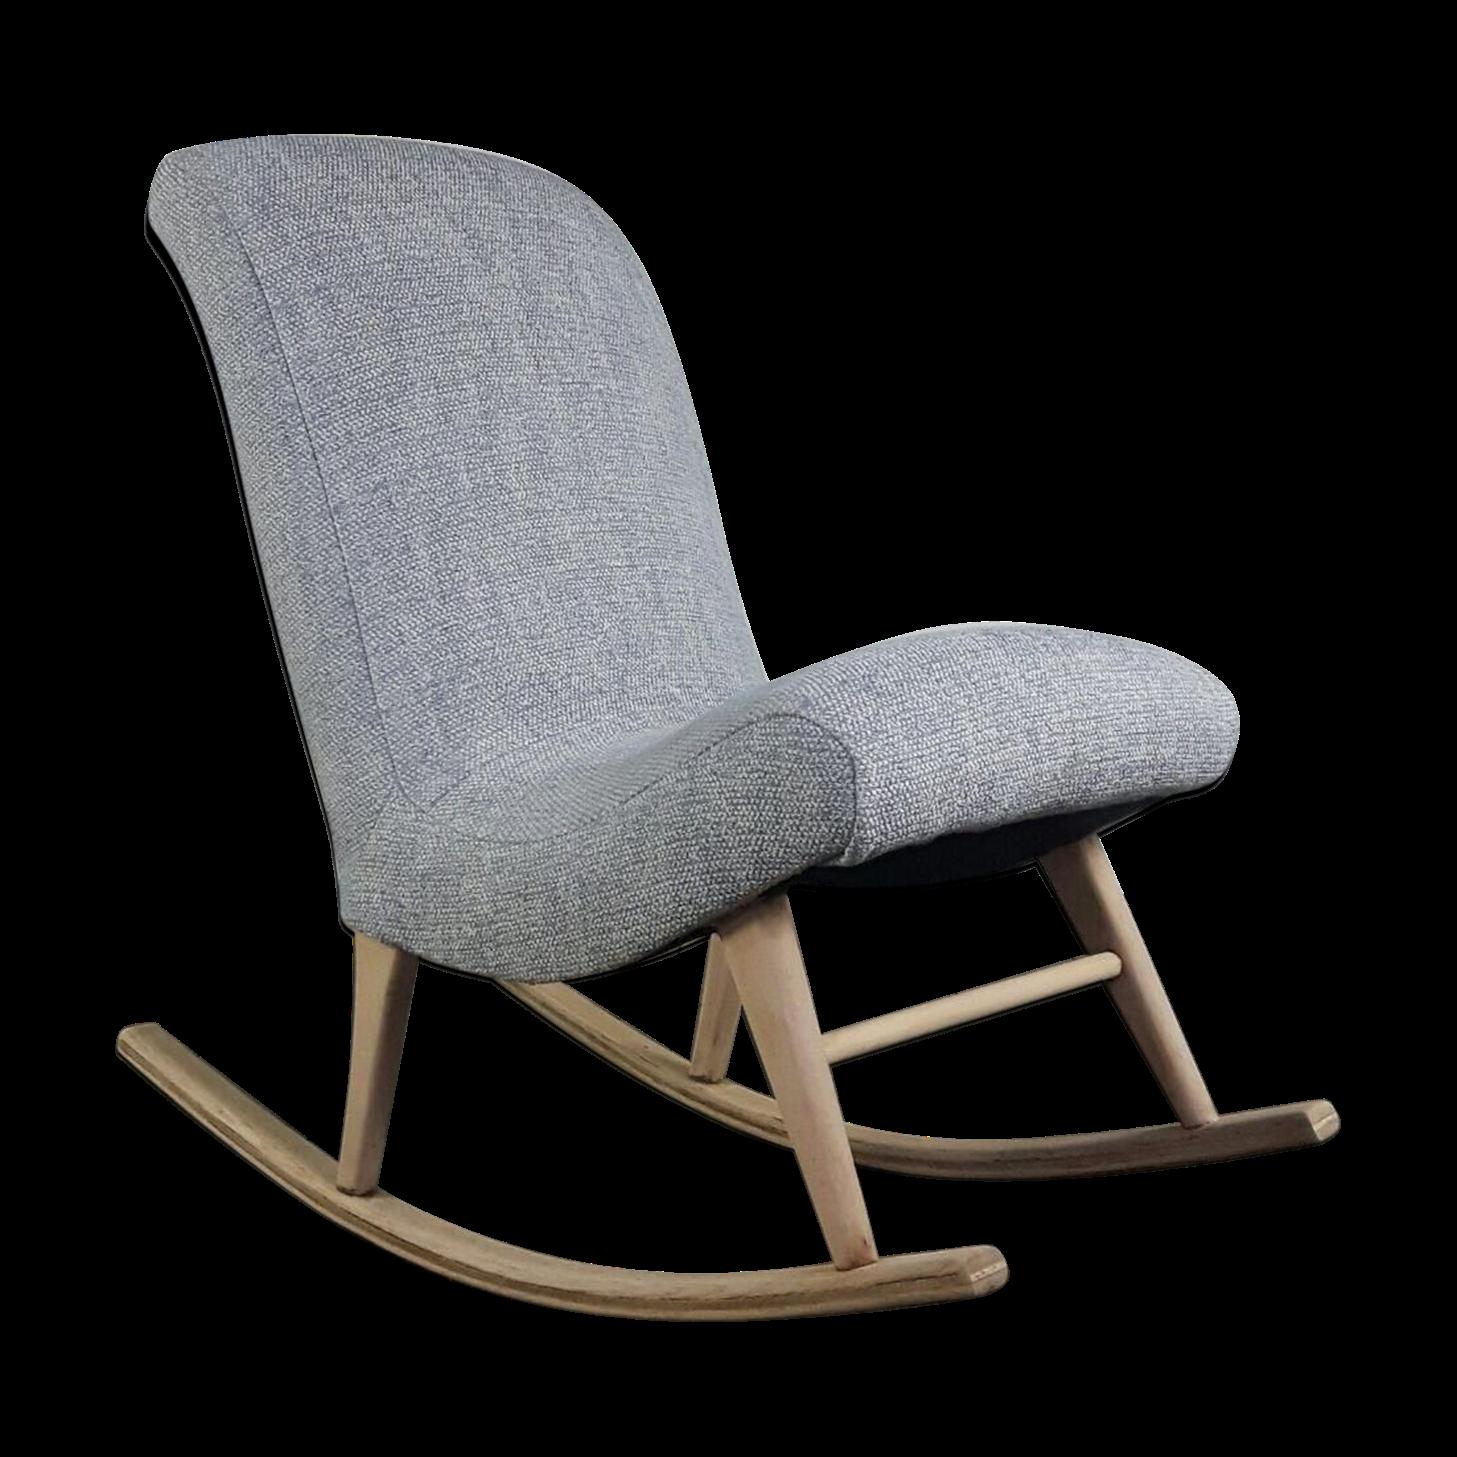 Scandinavian Rocking Chair   Wood   Grey   Scandinavian   GAFLABD